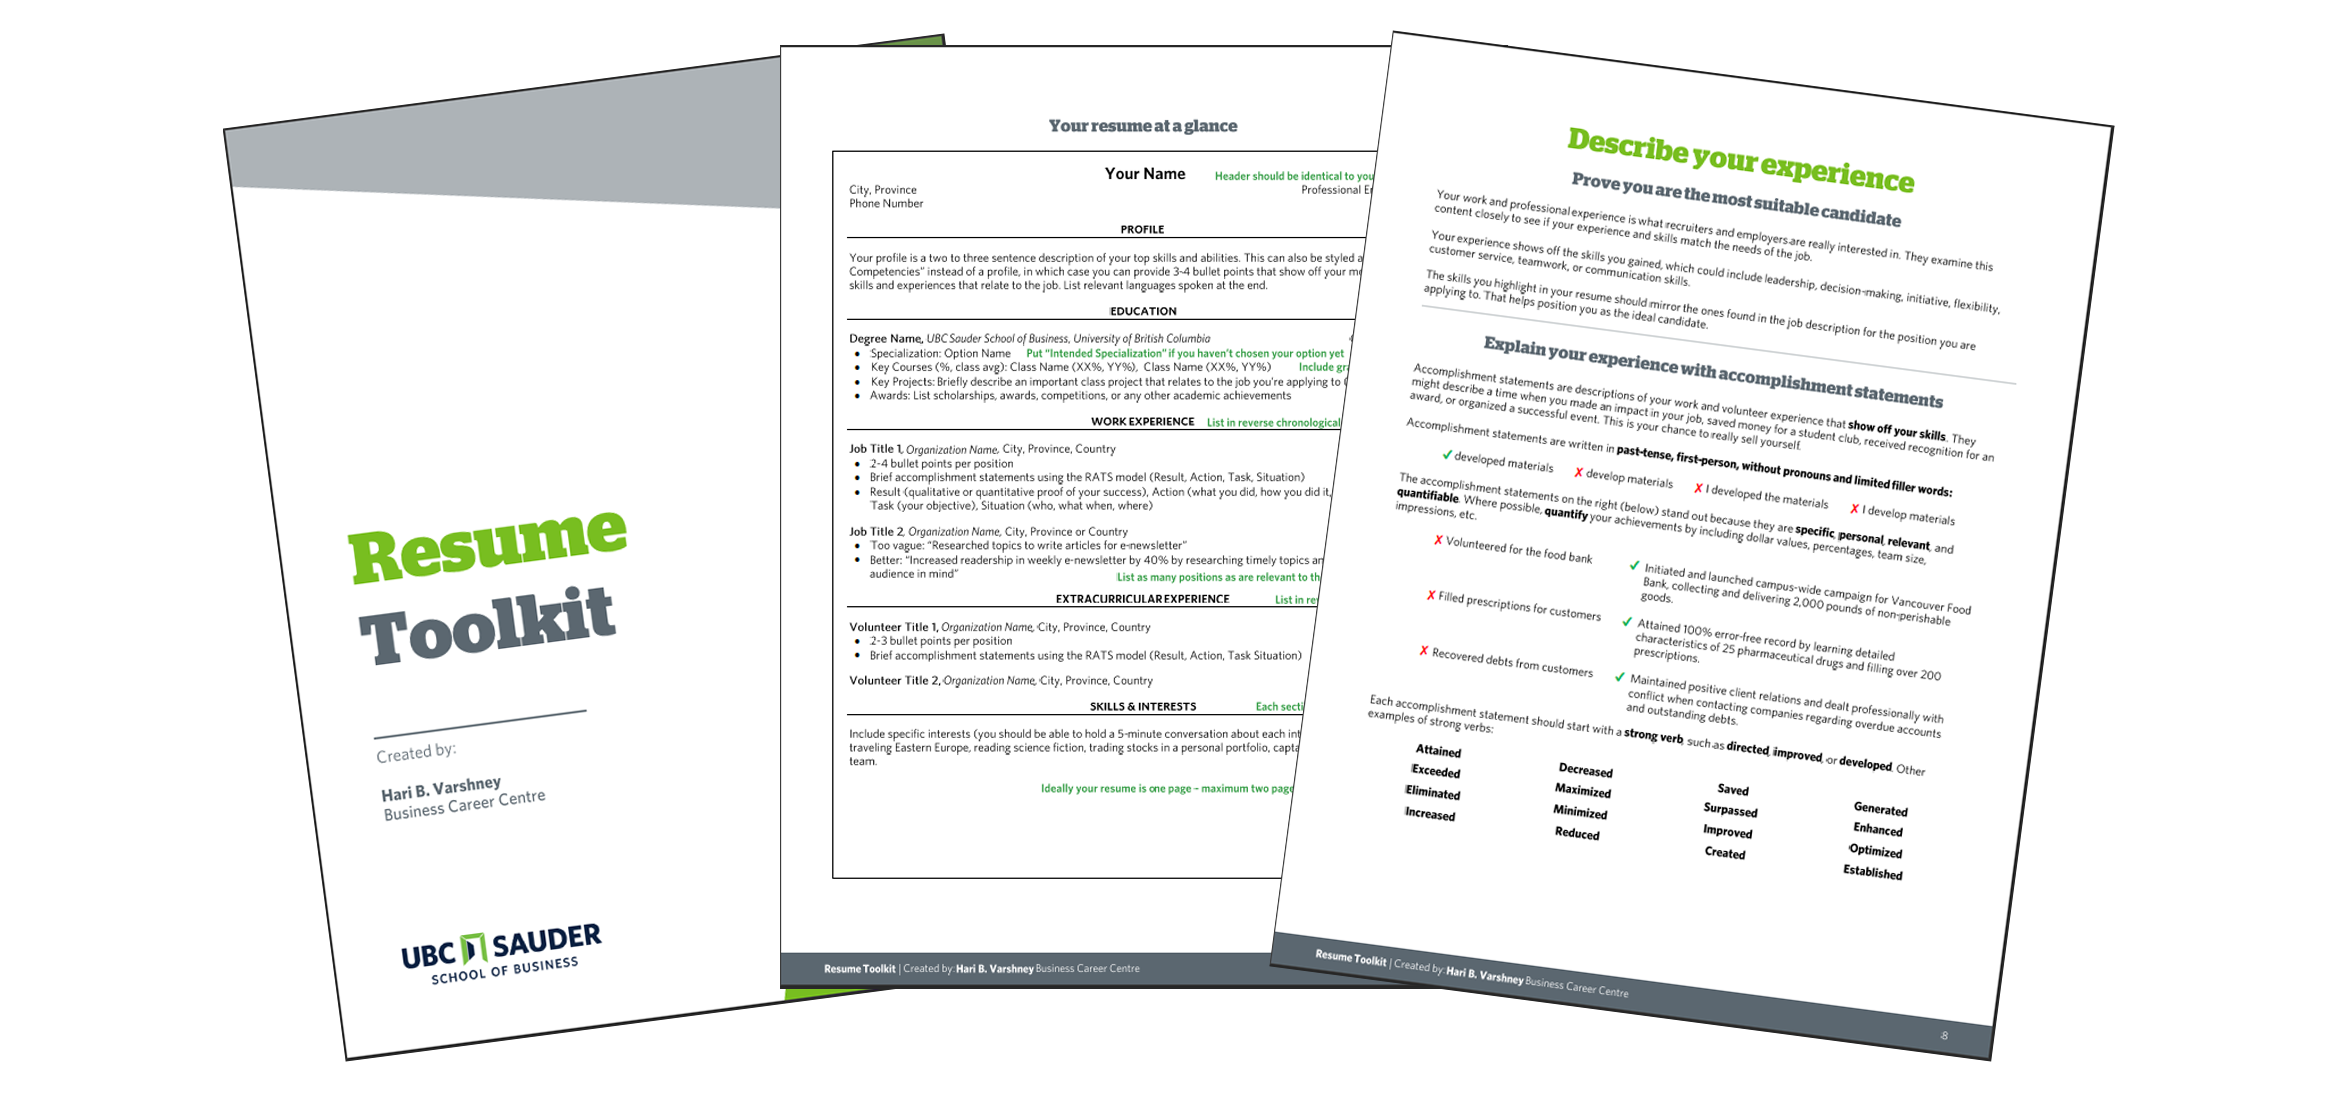 resume toolkit